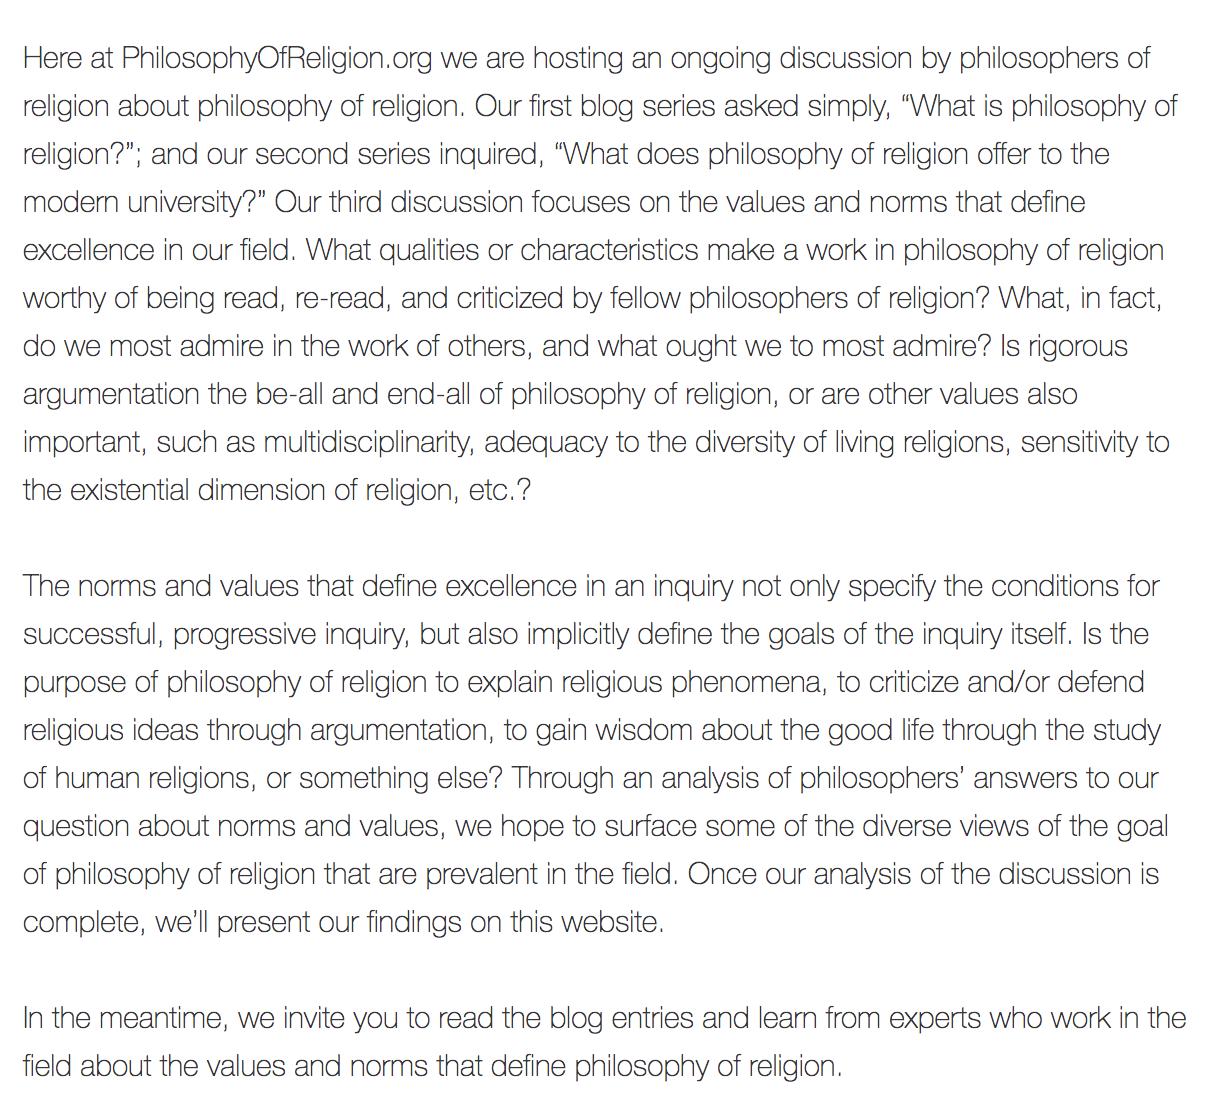 PhilOfRel Blog